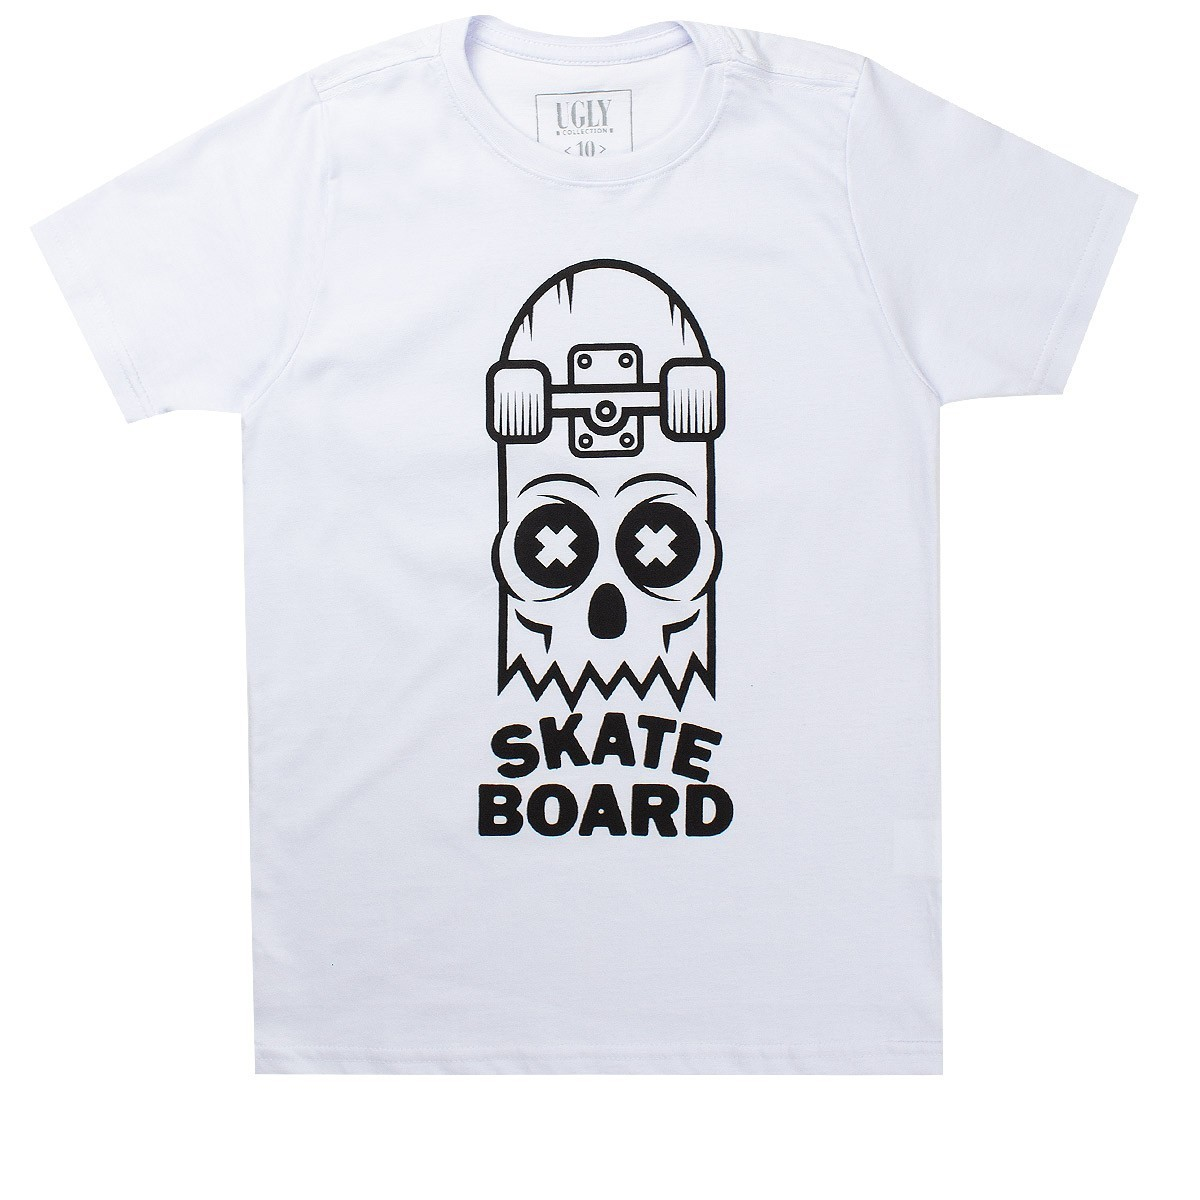 Camiseta Infantil Masculina Skate Board Branco - Ugly